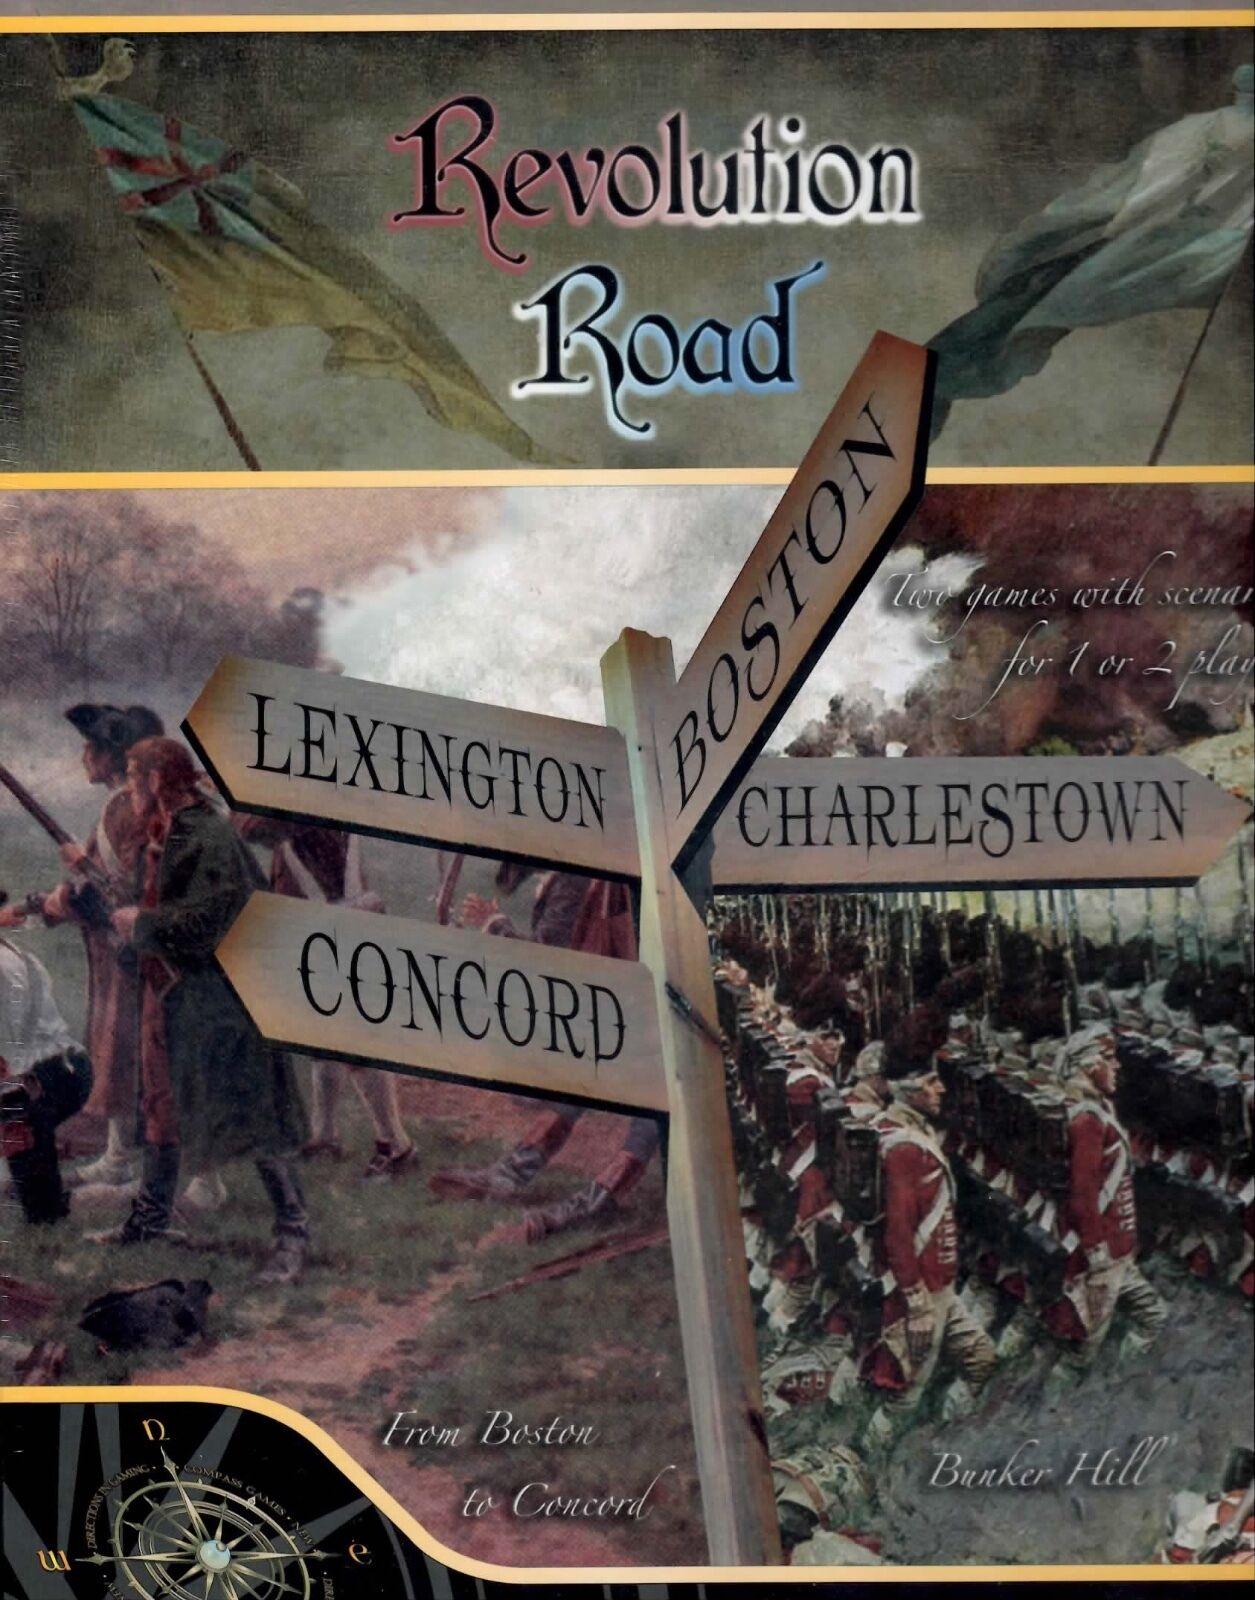 Compass Games Révolution RD  Boston, Charlestown,  Concord & Lexington Cellophane  prix plancher